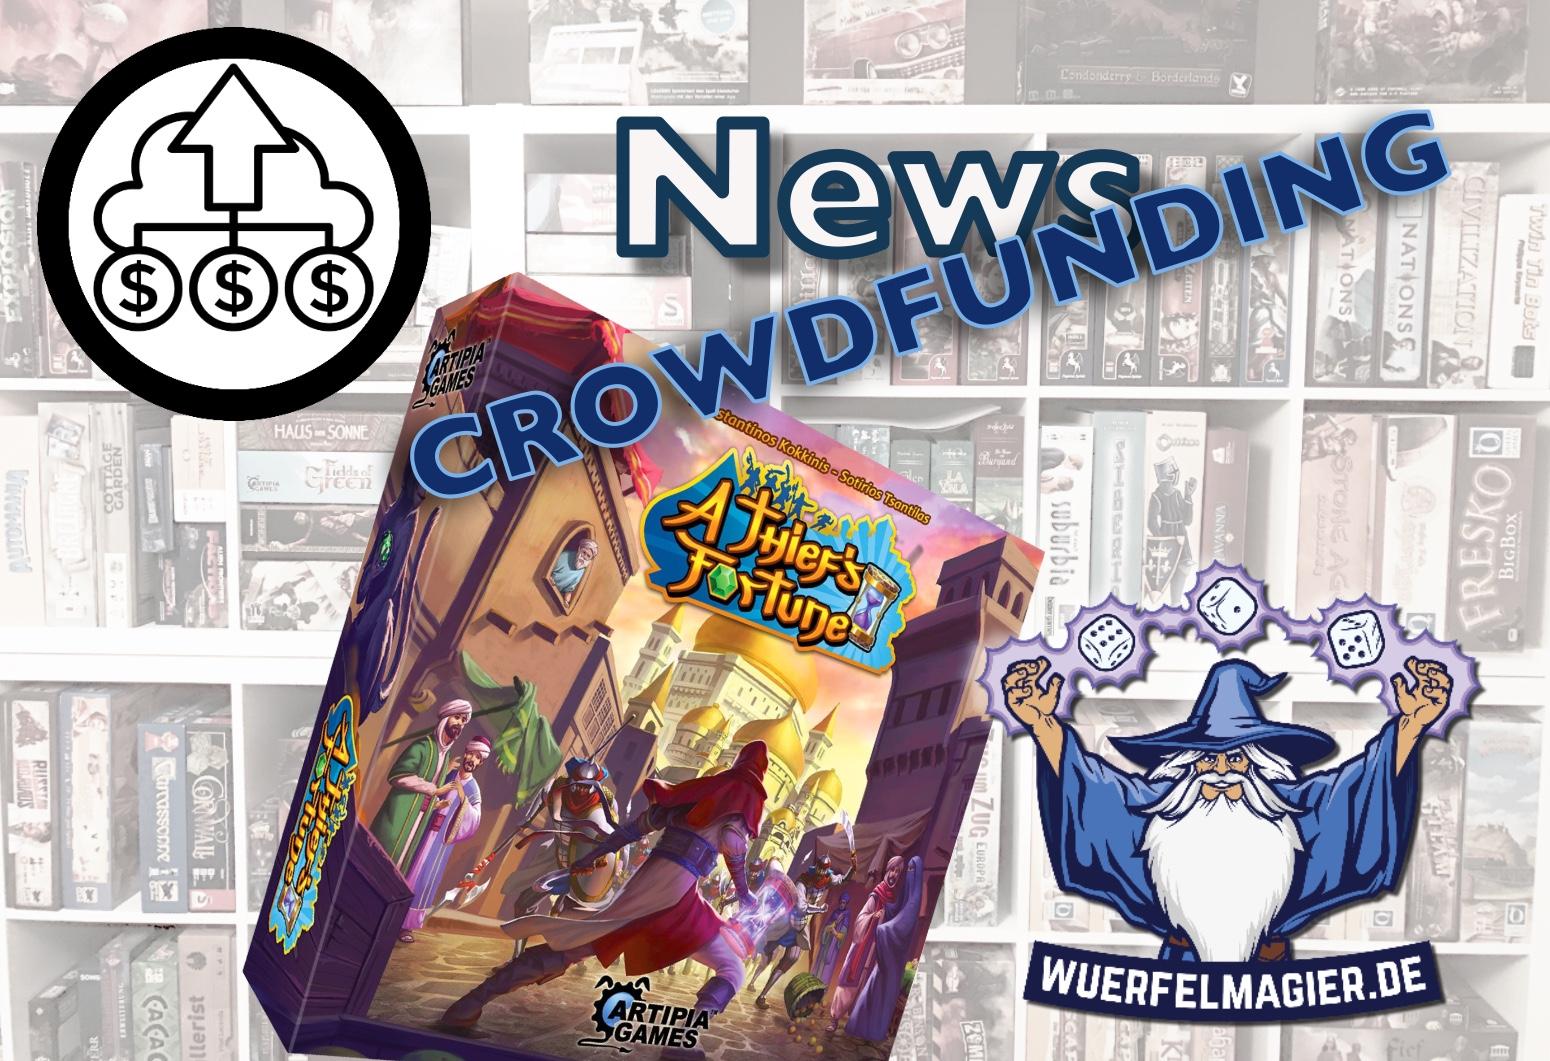 News Crowdfunding Artipia Games A Thief's Fortune